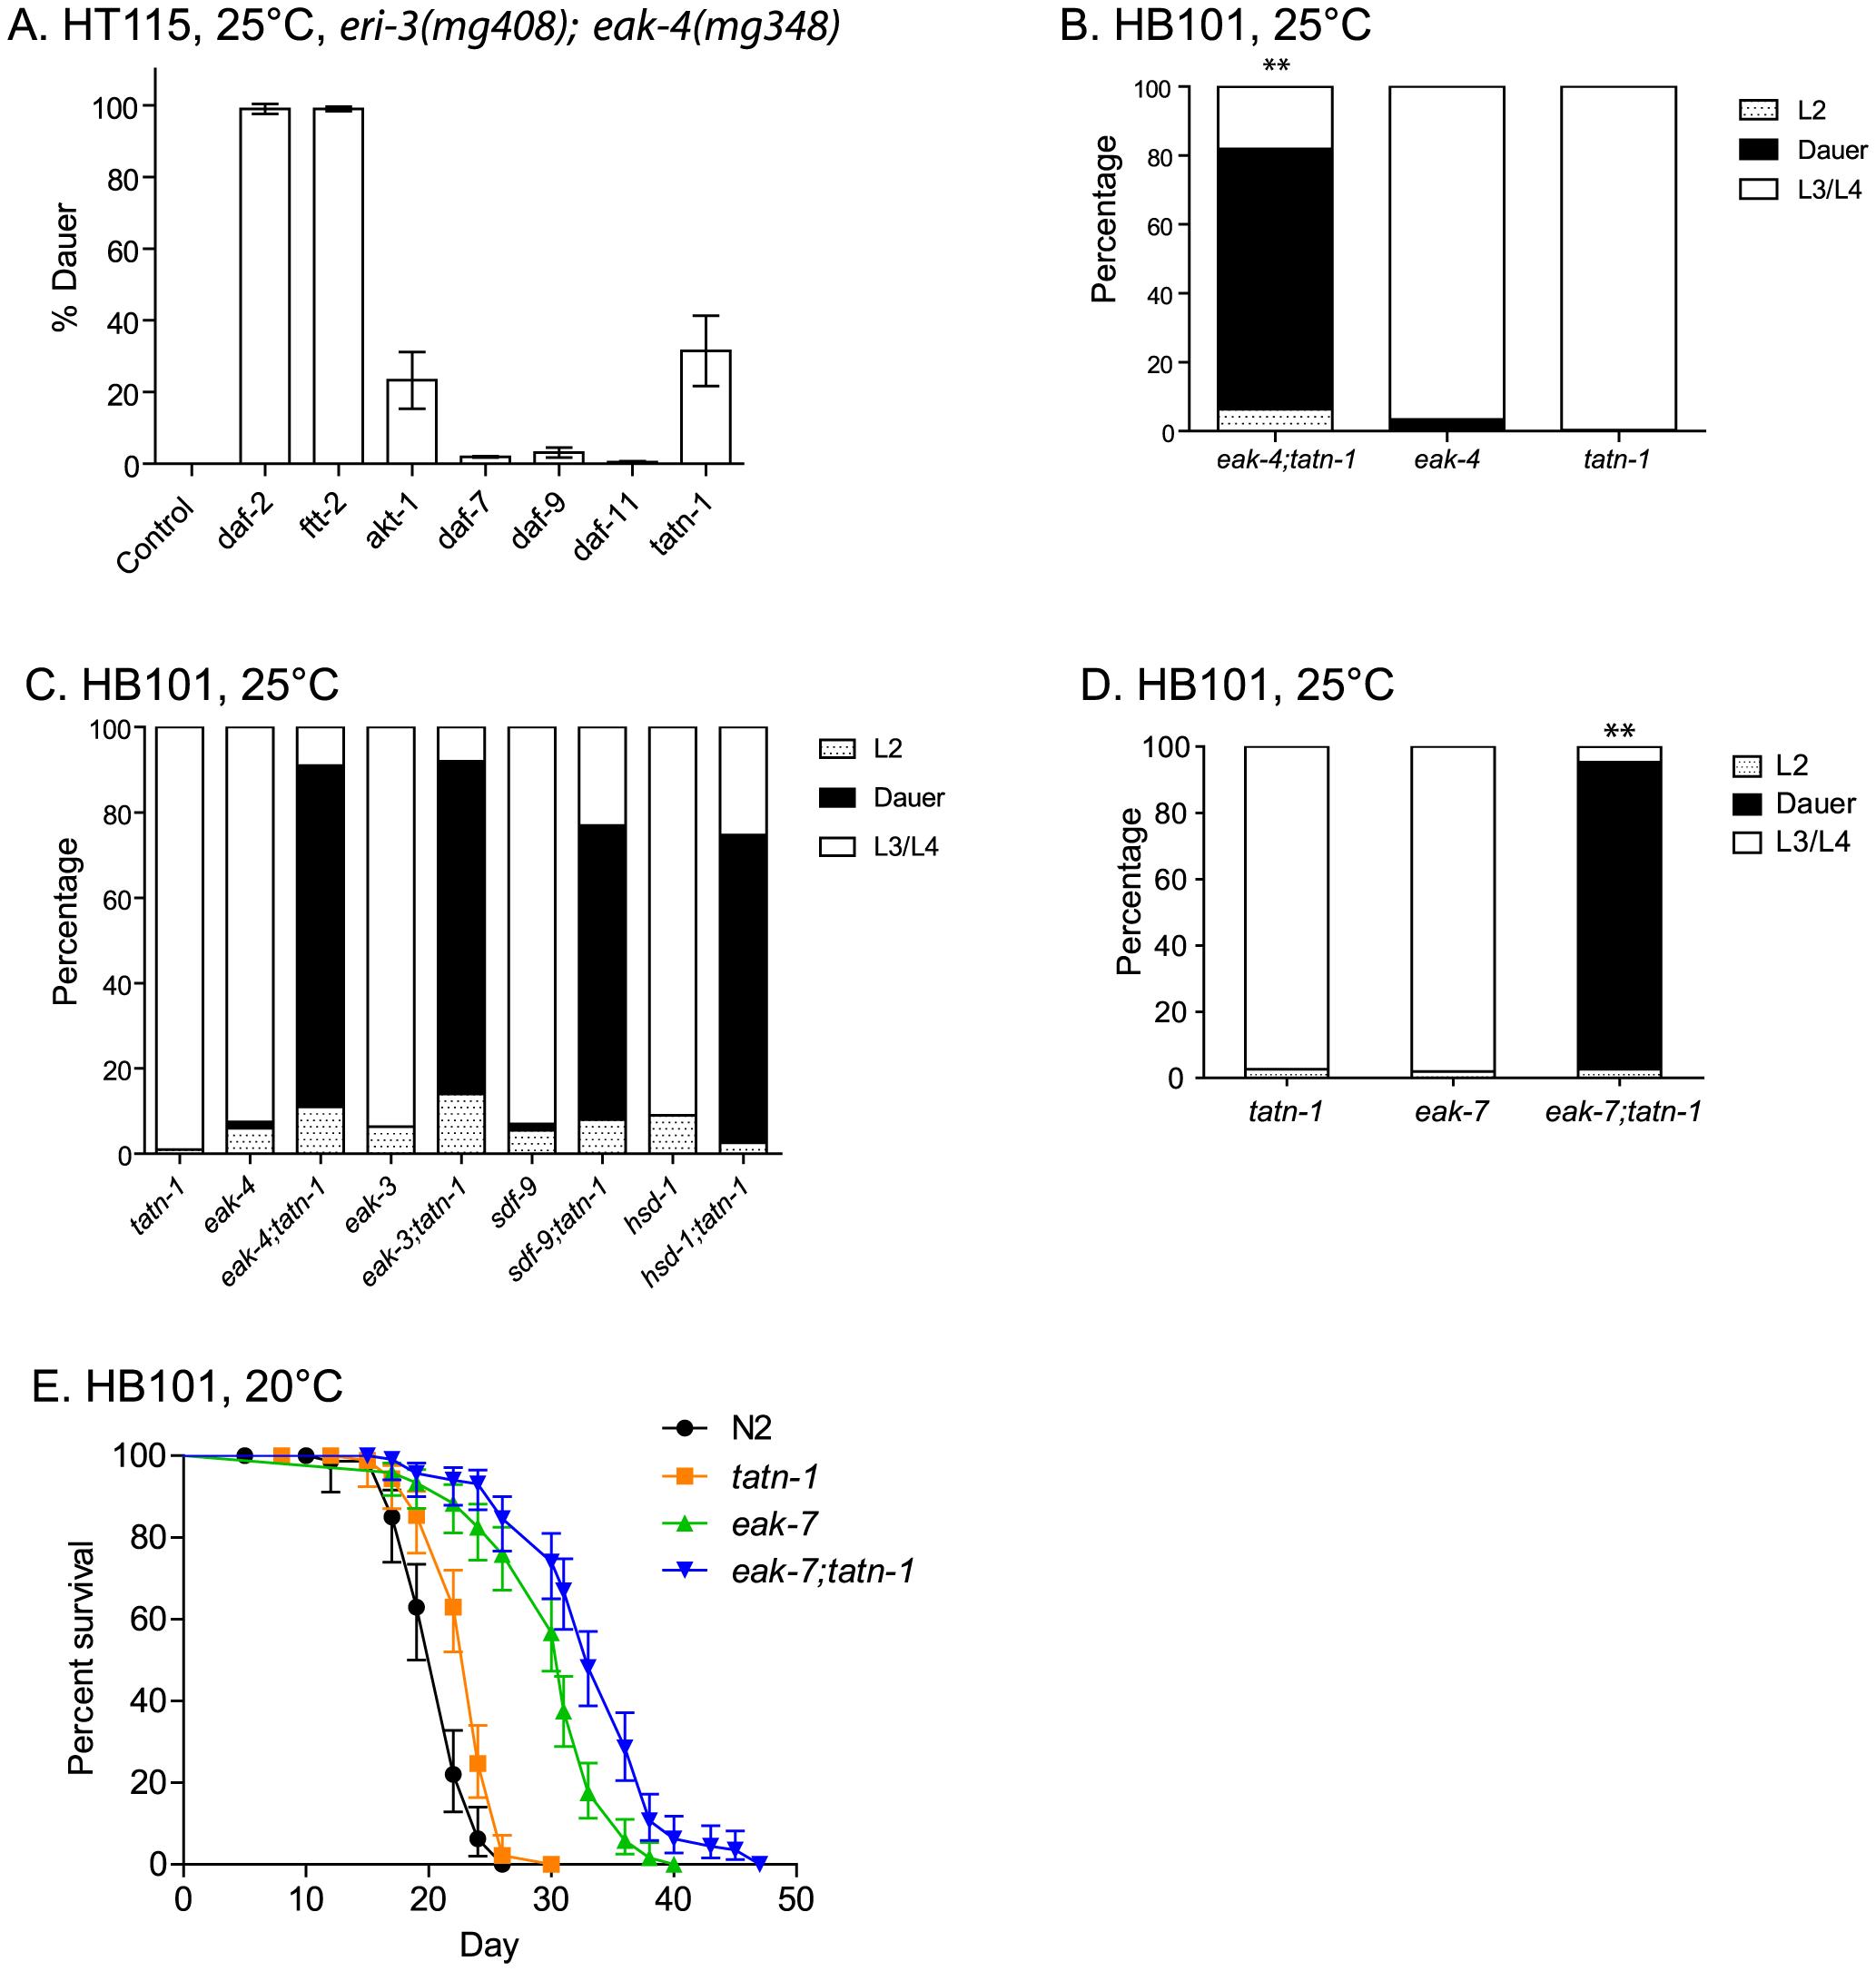 Tyrosine aminotransferase mutations enhance <i>eak</i> dauer and lifespan phenotypes.